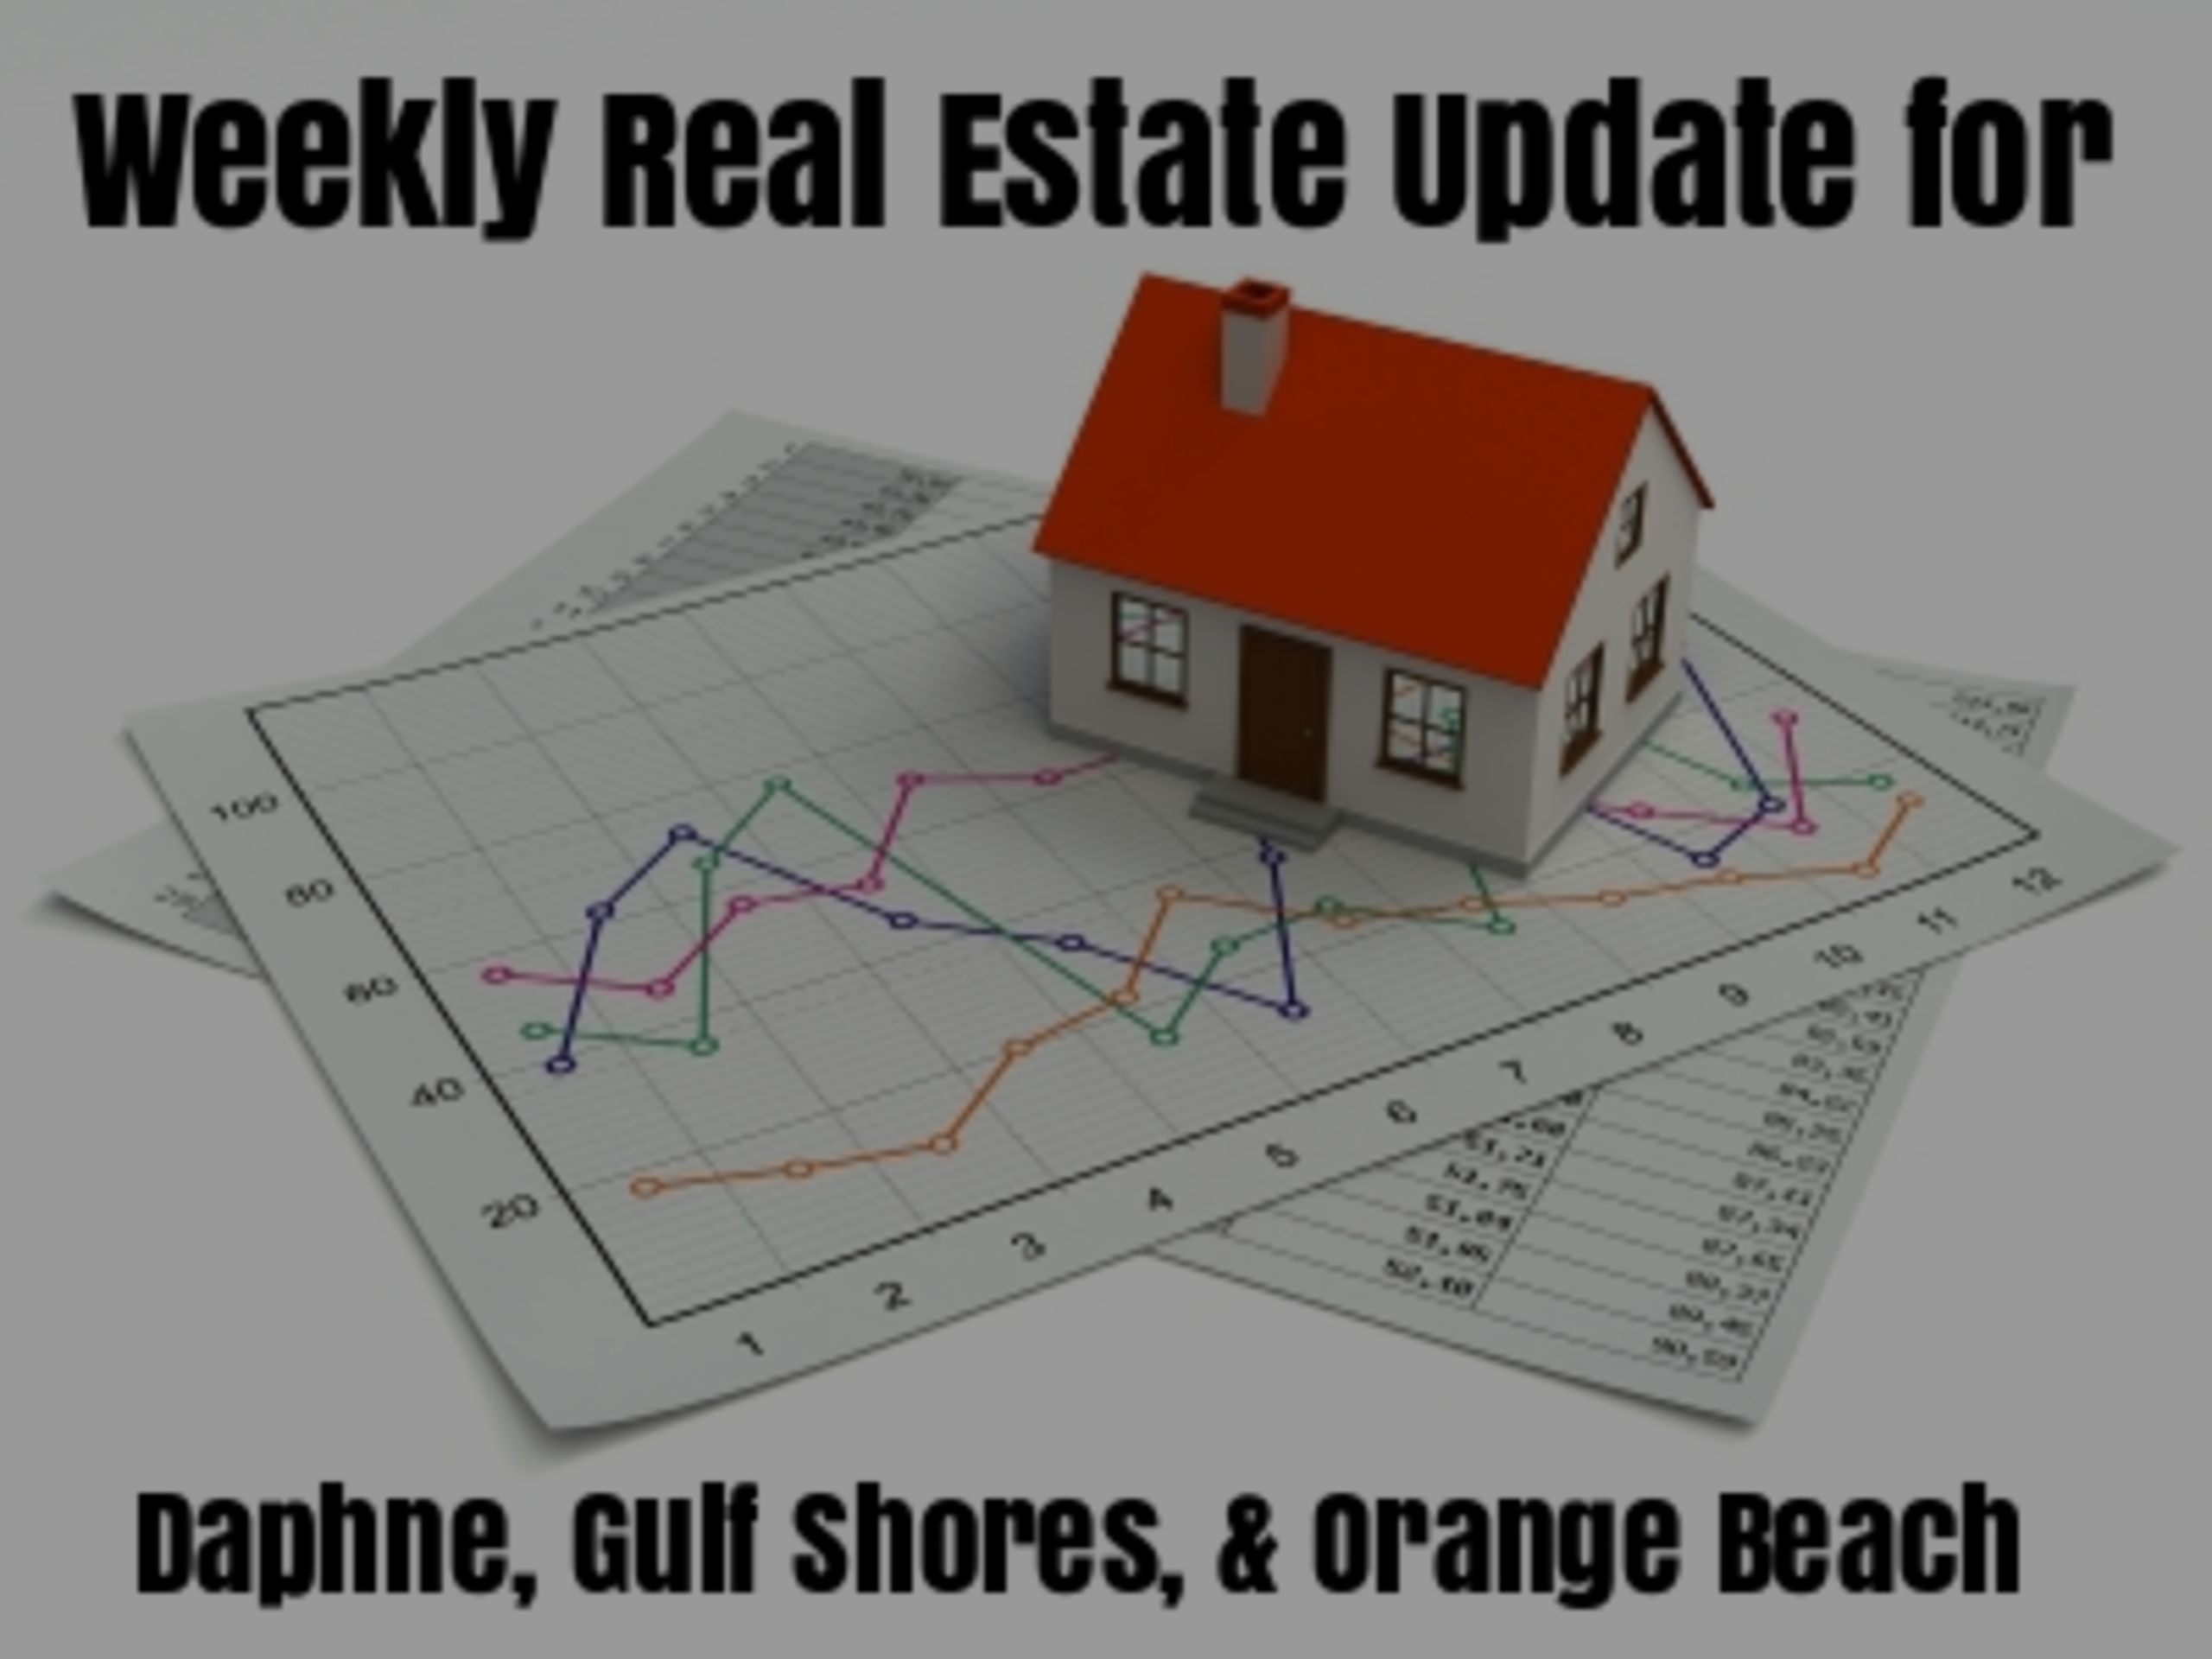 Weekly Real Estate Update – Daphne, Gulf Shores, and Orange Beach – 2/20/17